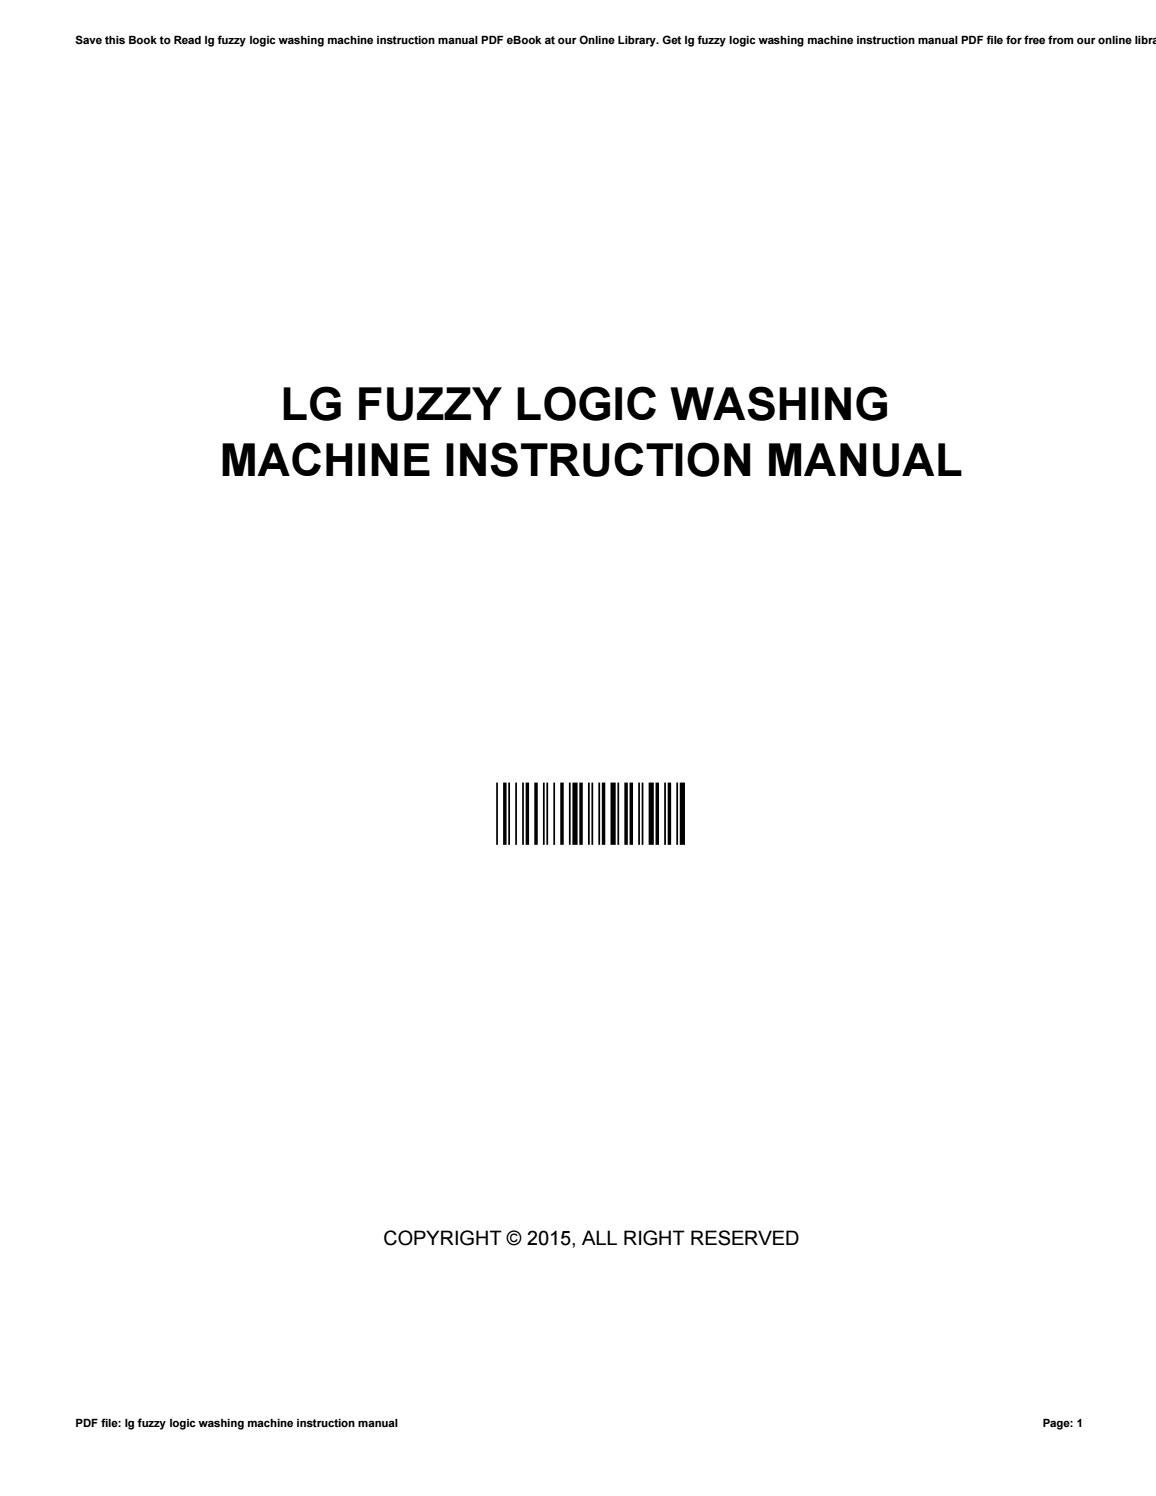 Lg fuzzy logic washing machine instruction manual by StevenCarr180211 -  issuu